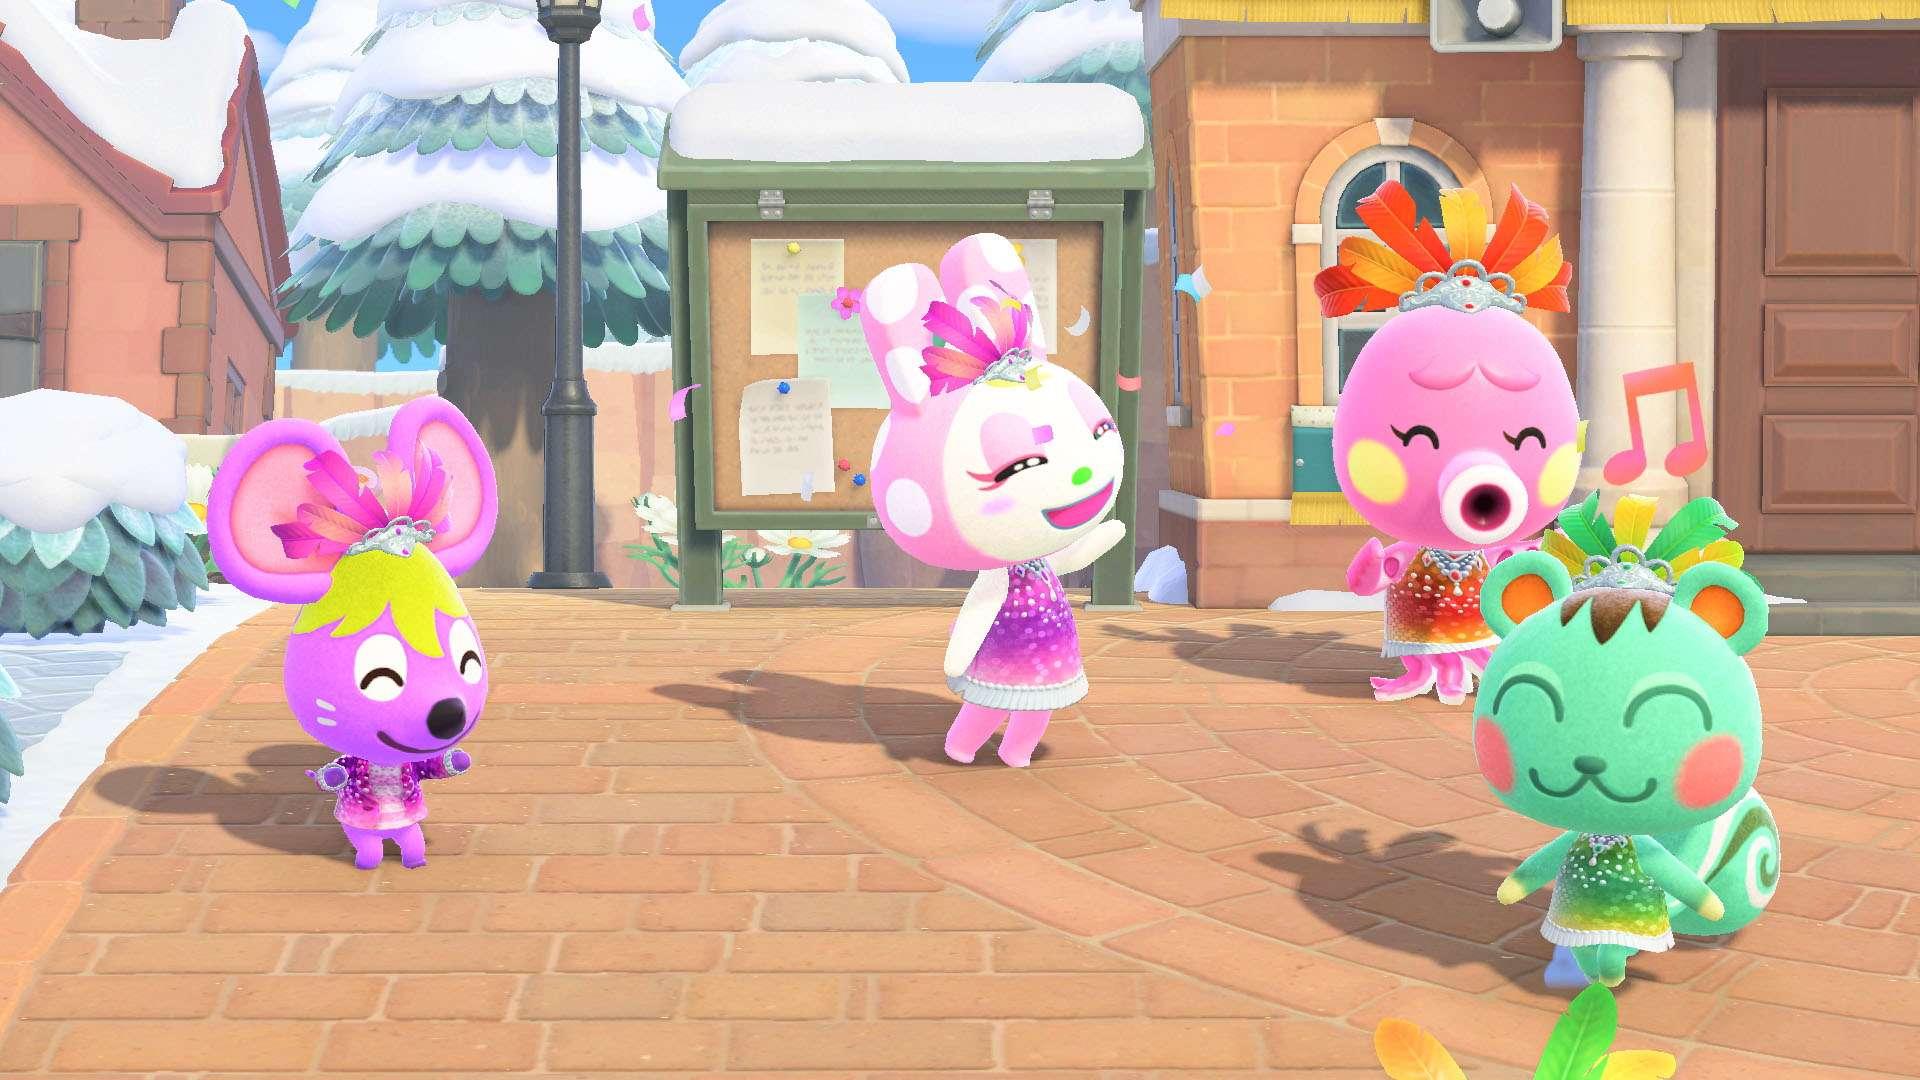 Animal Crossing New Horizons Carnaval Actualizacion 3 - El Carnaval llega a Animal Crossing: New Horizons